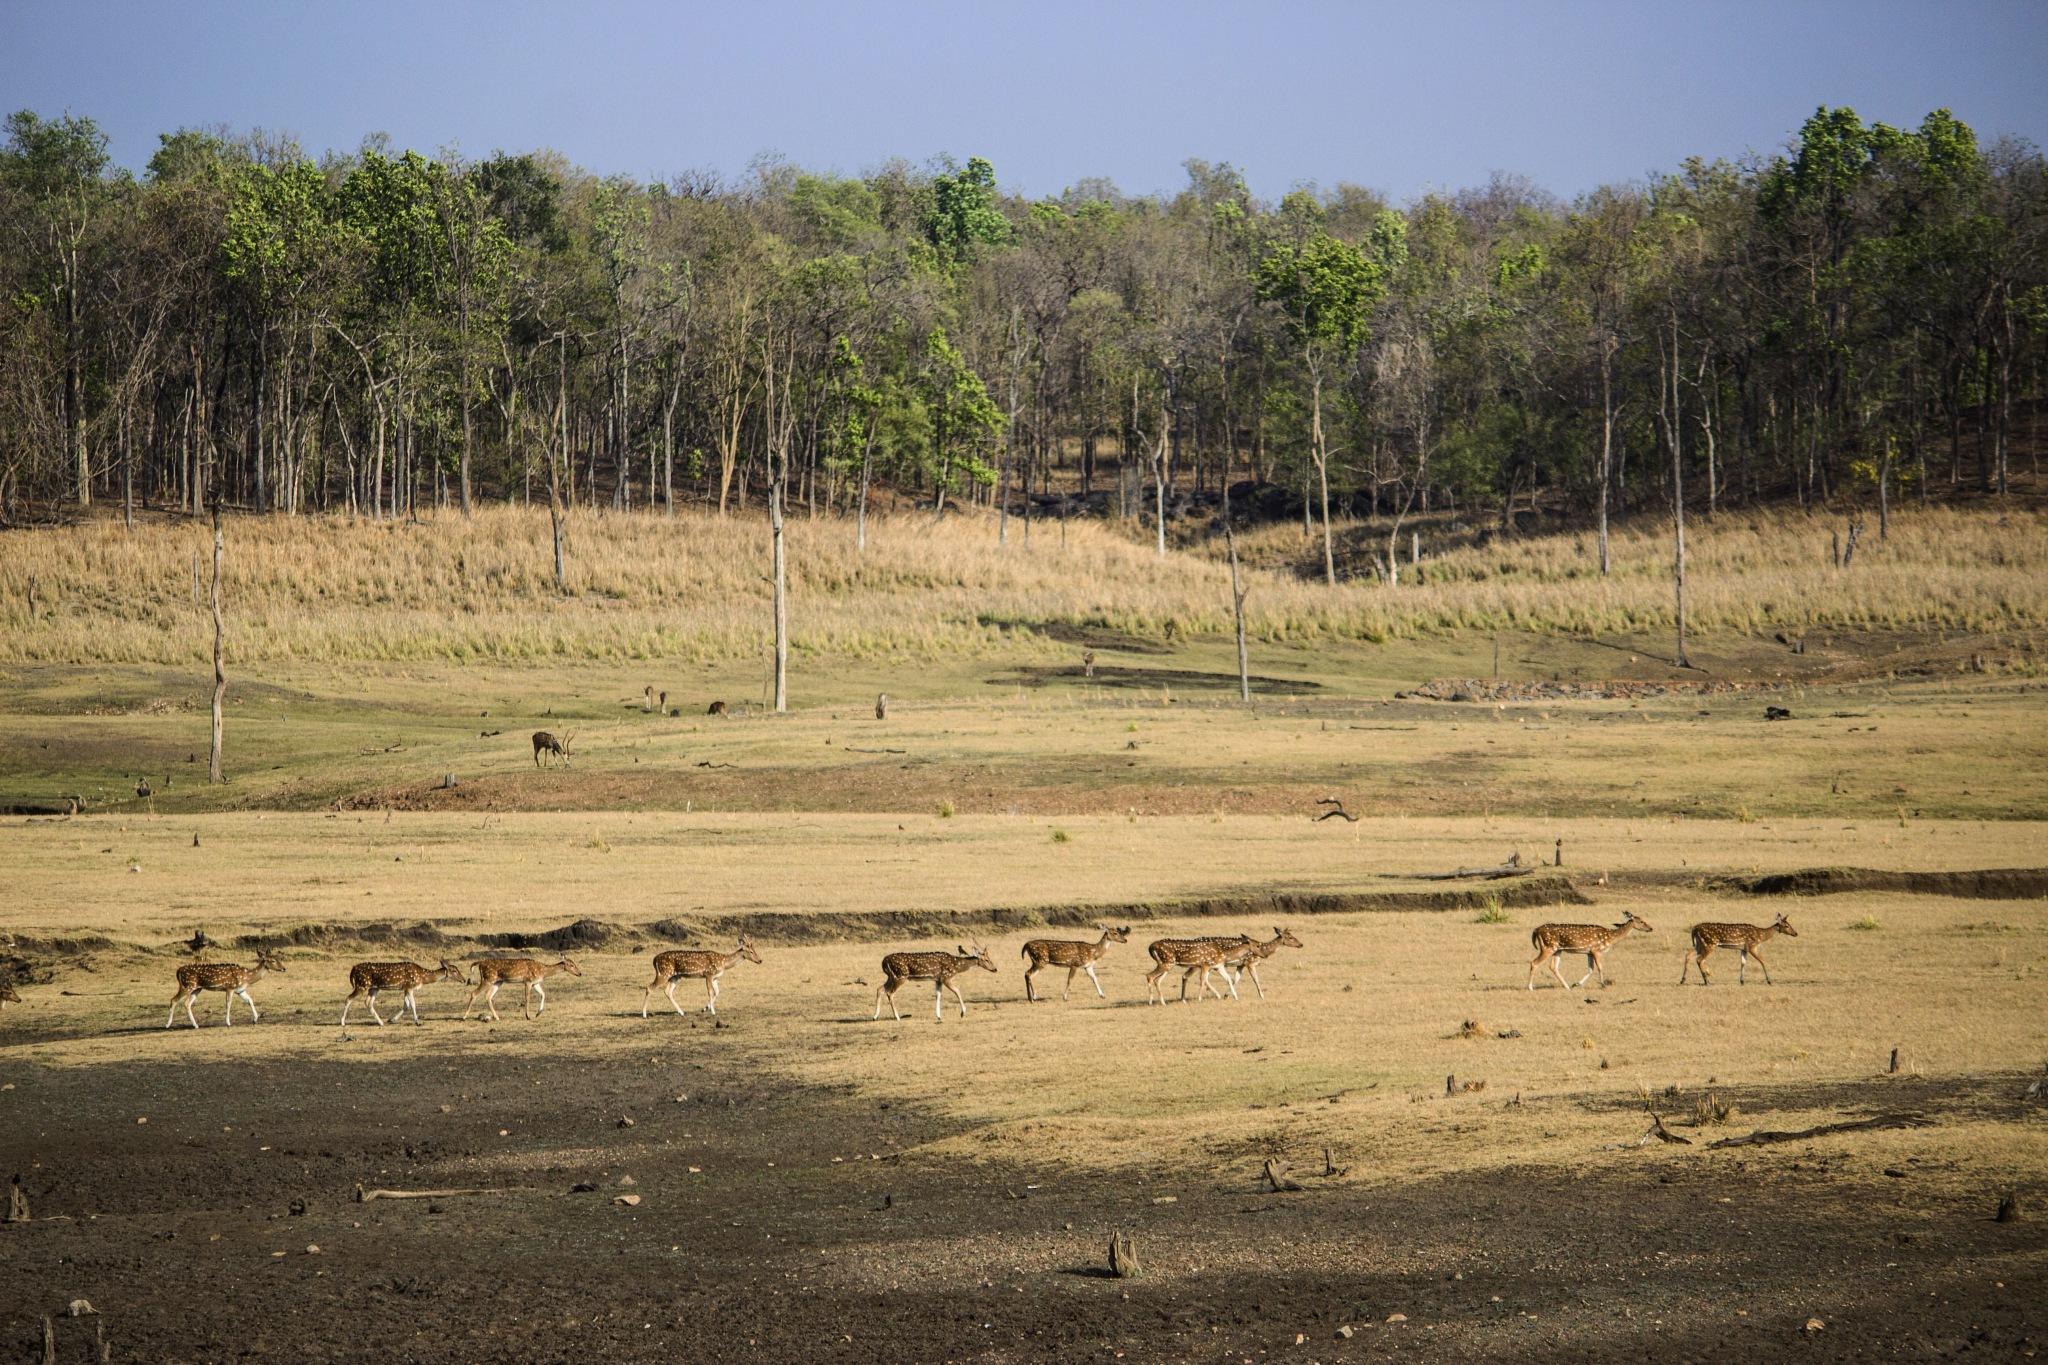 The land of Animals by Piyush Mishra